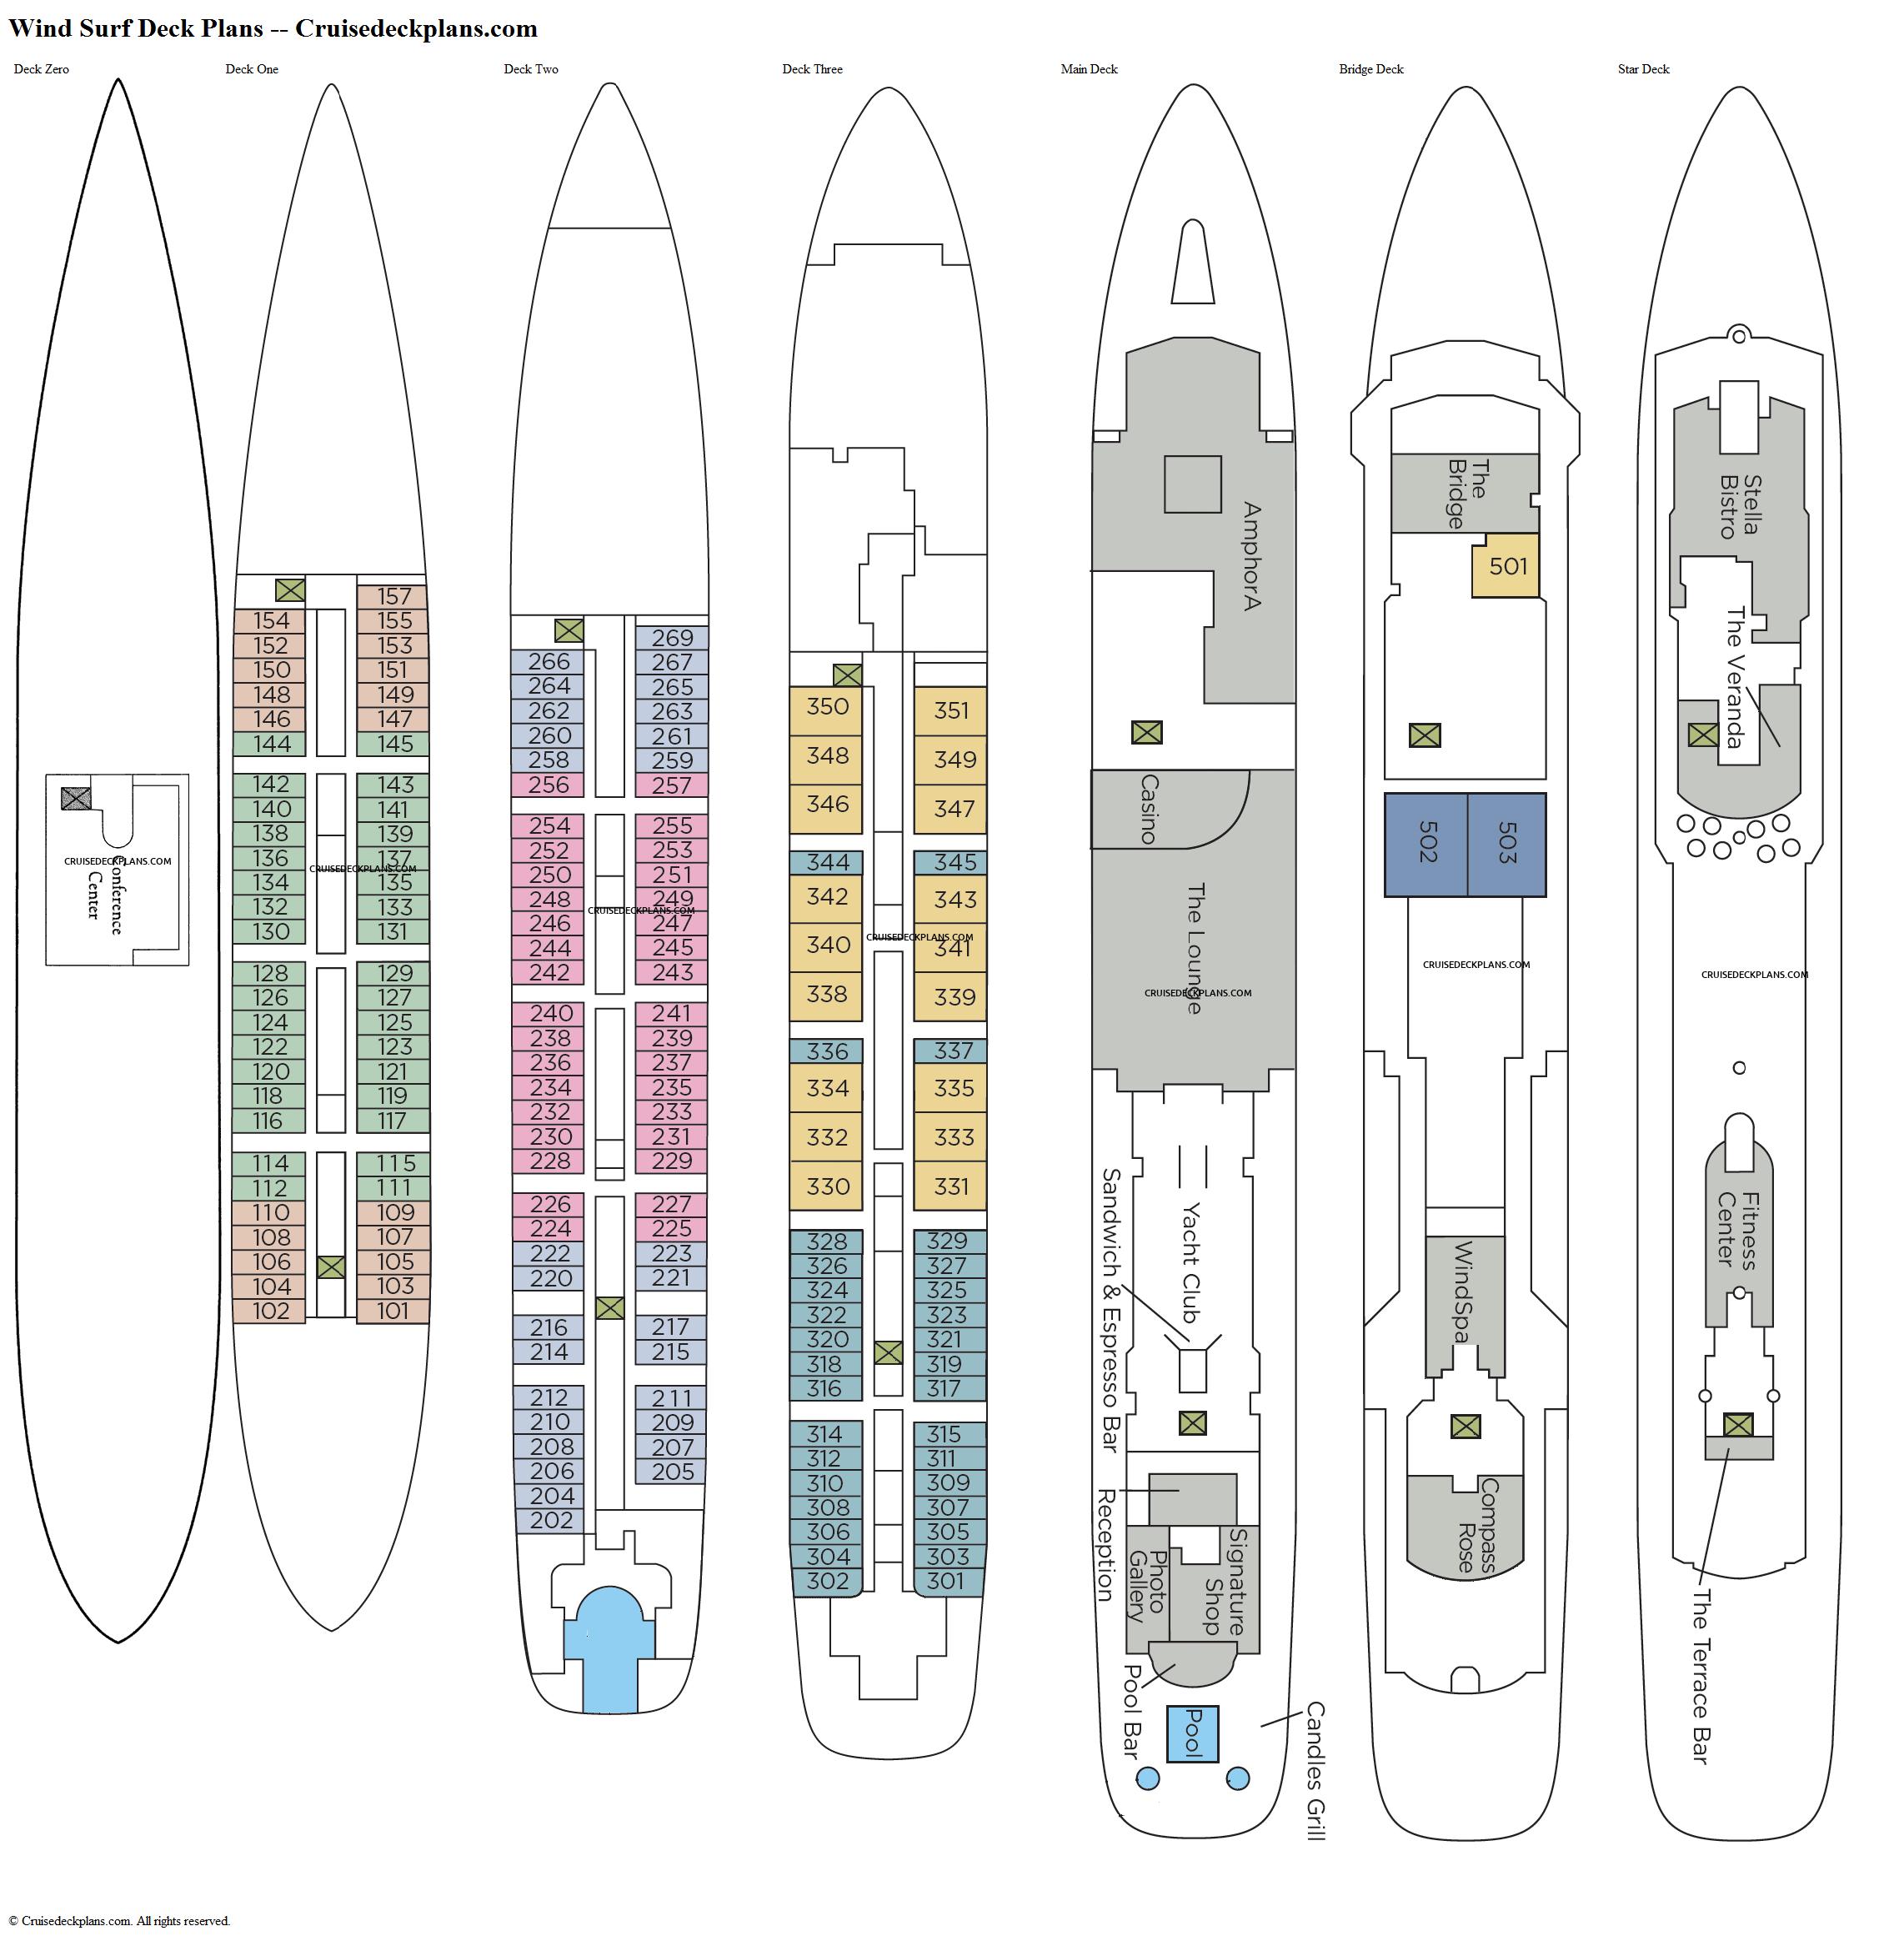 Wind Surf Deck Plans Diagrams Pictures Video - Cruise ship floor plans